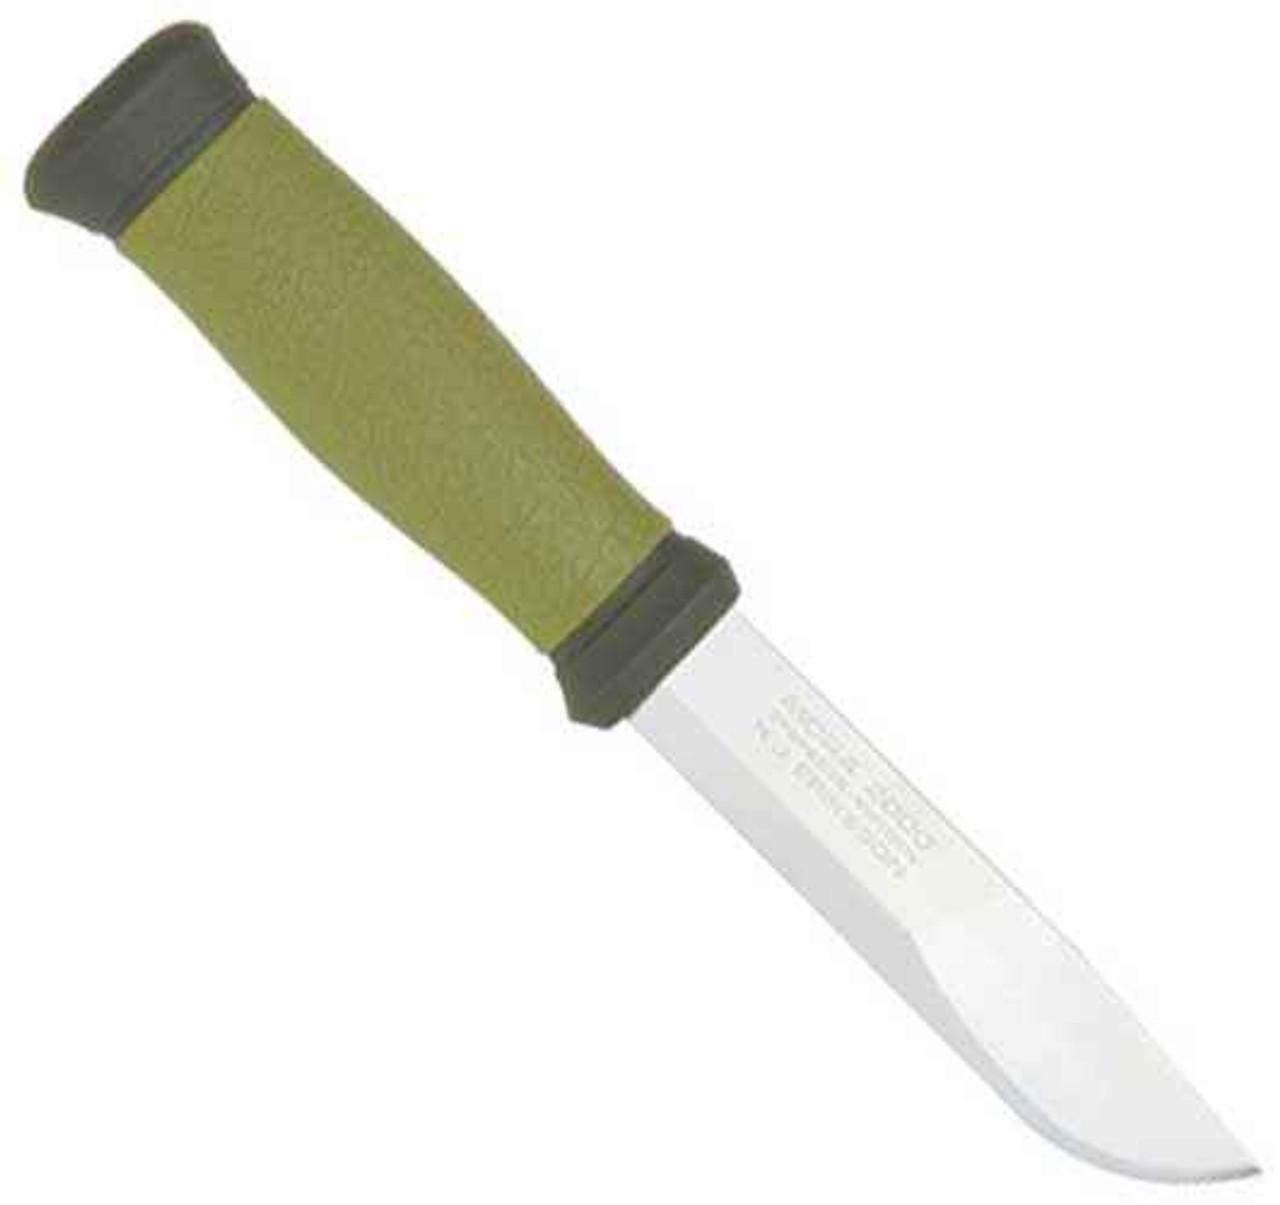 Mora FOS 2000 Knife